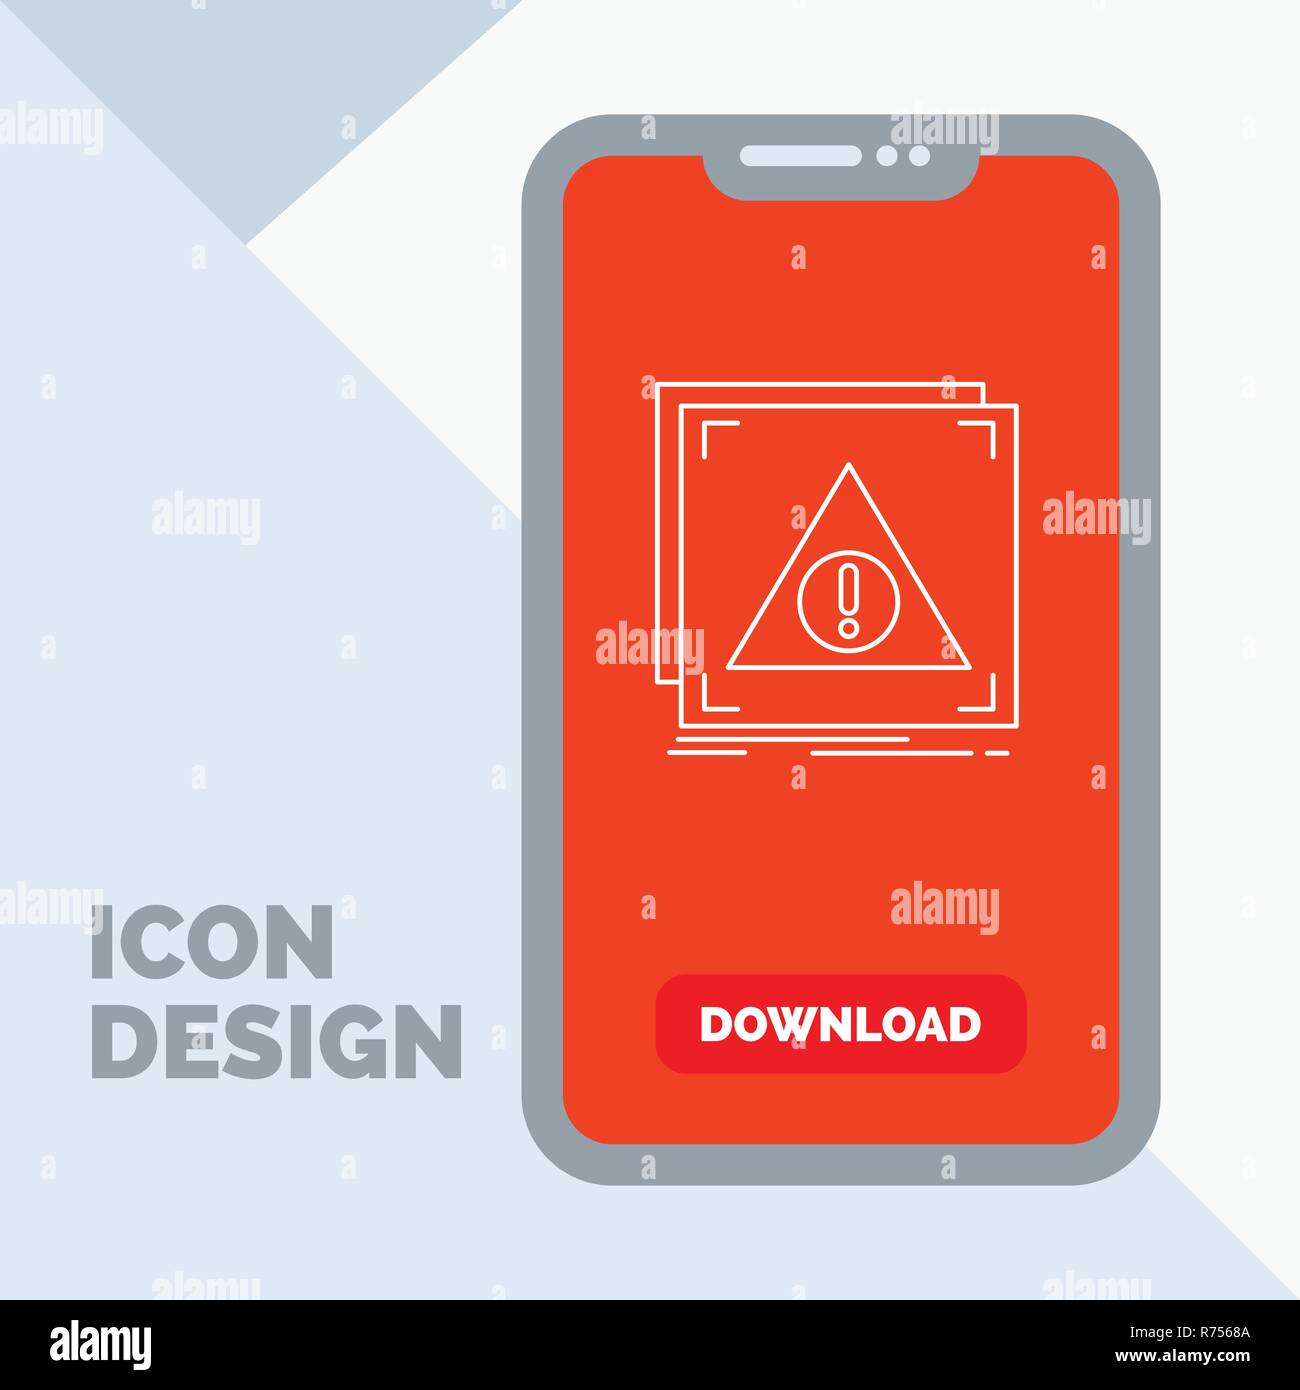 Error, Application, Denied, server, alert Line Icon in Mobile for Download Page - Stock Image